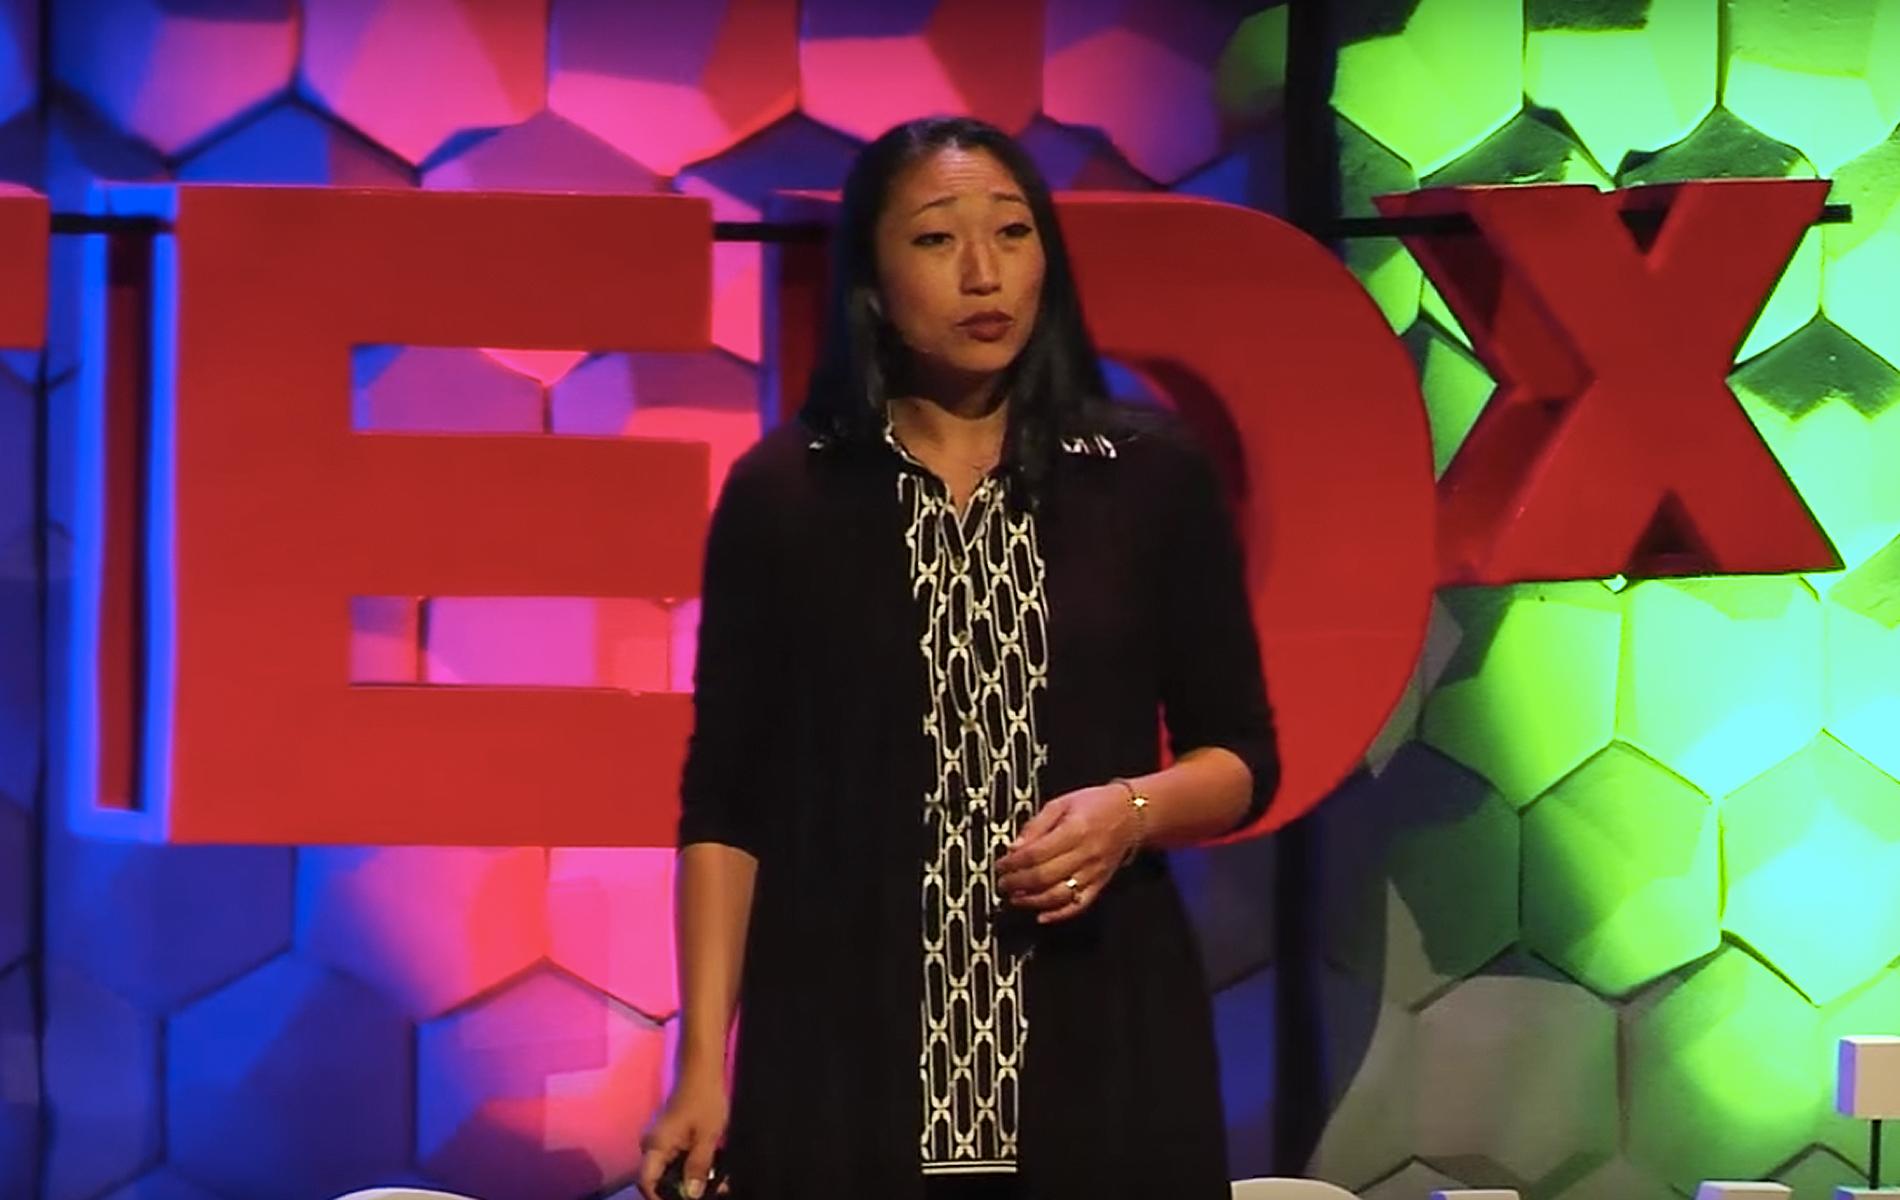 VIDEO: TEDx Talk – The Porn Paradox